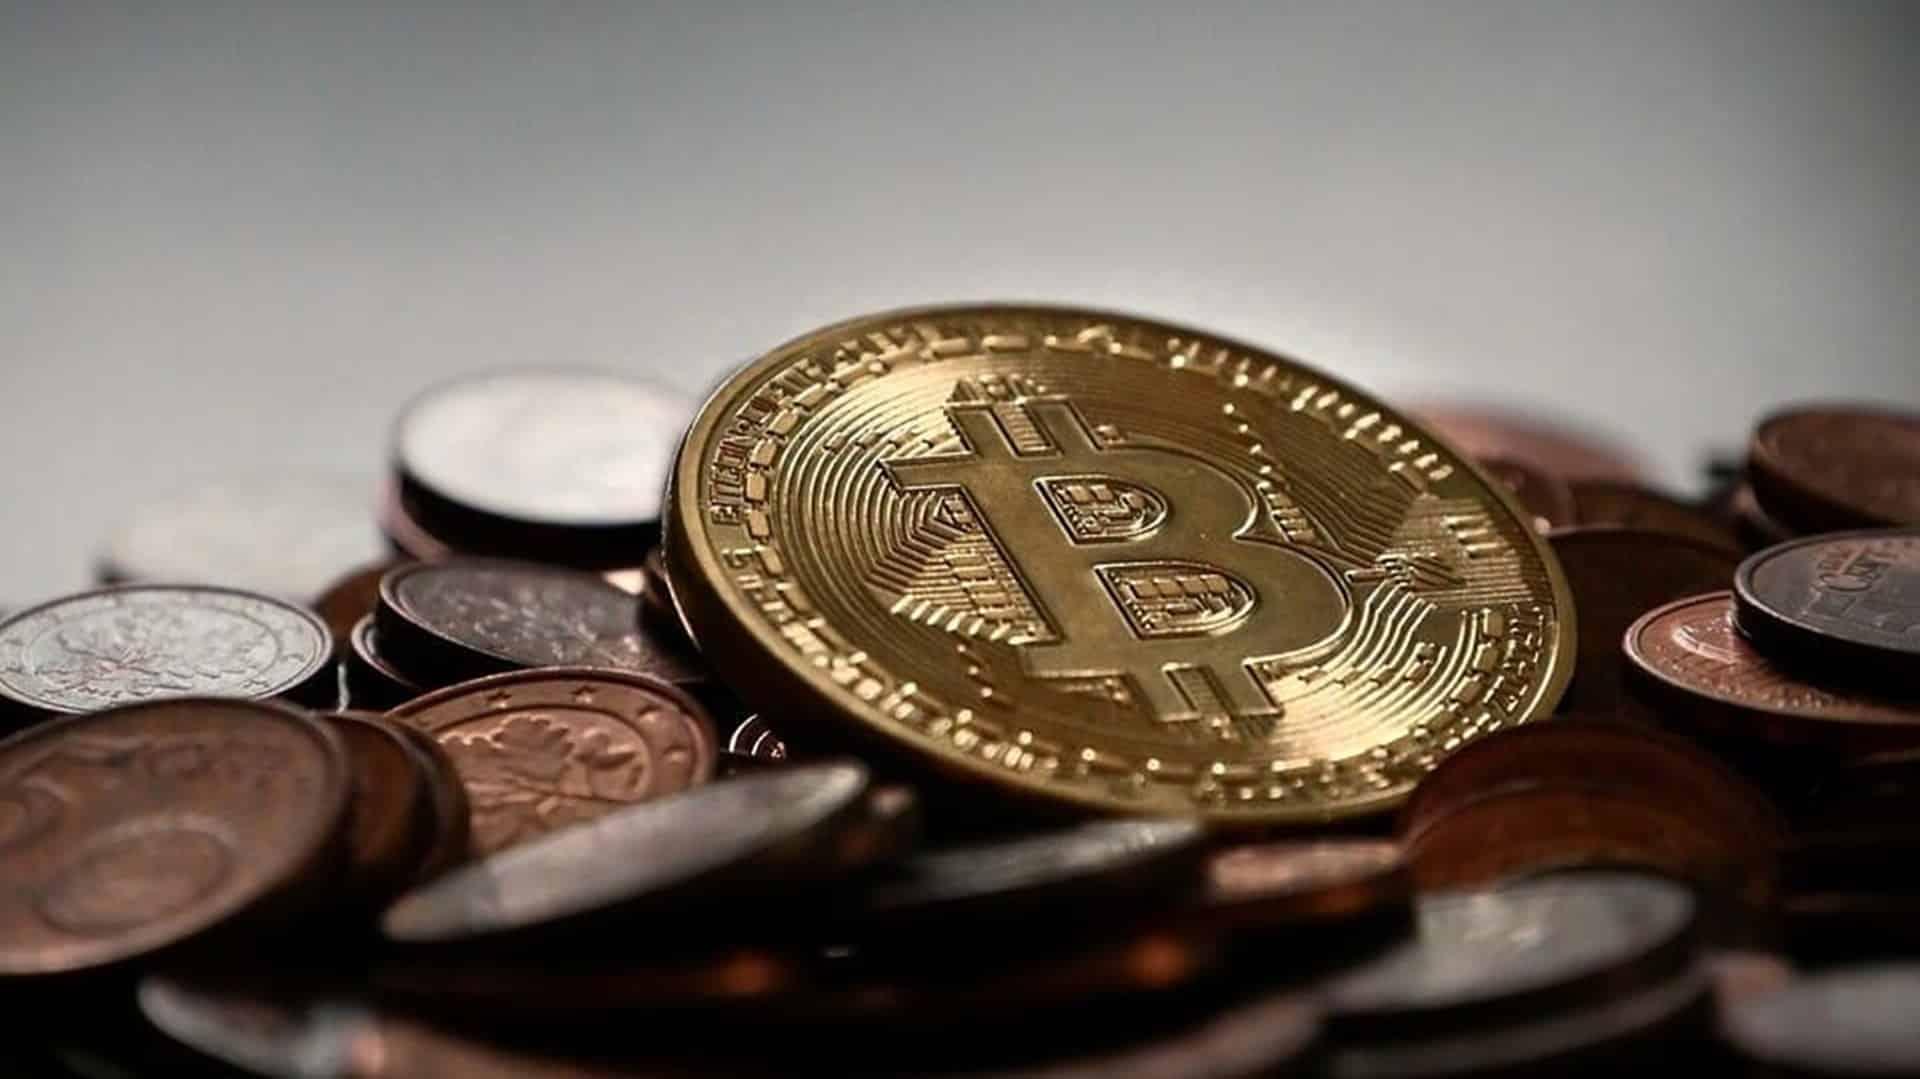 bitcoin become legal tender in El Salvador